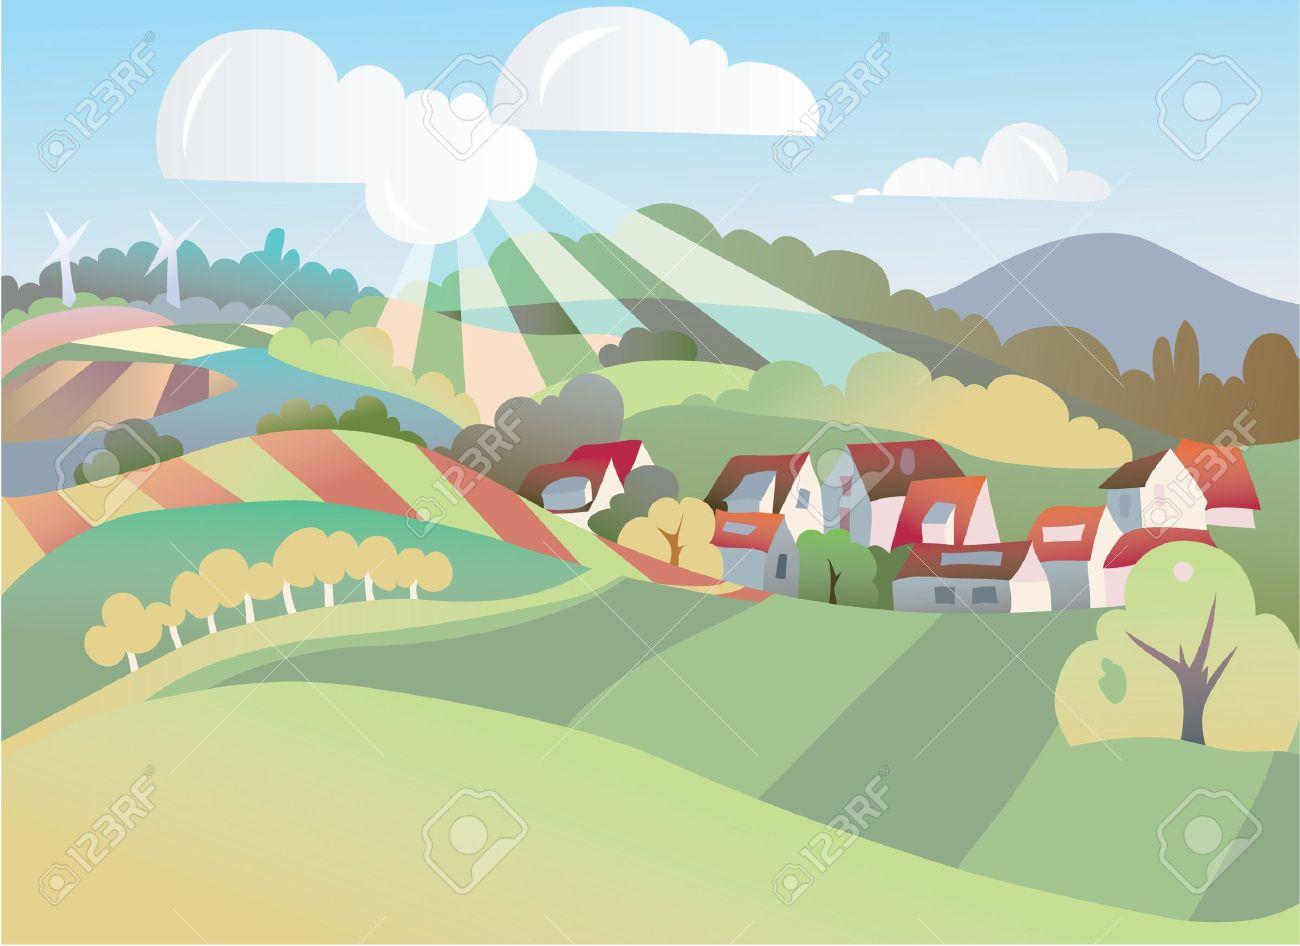 seasonal landscape illustration Stock Vector - 10633567